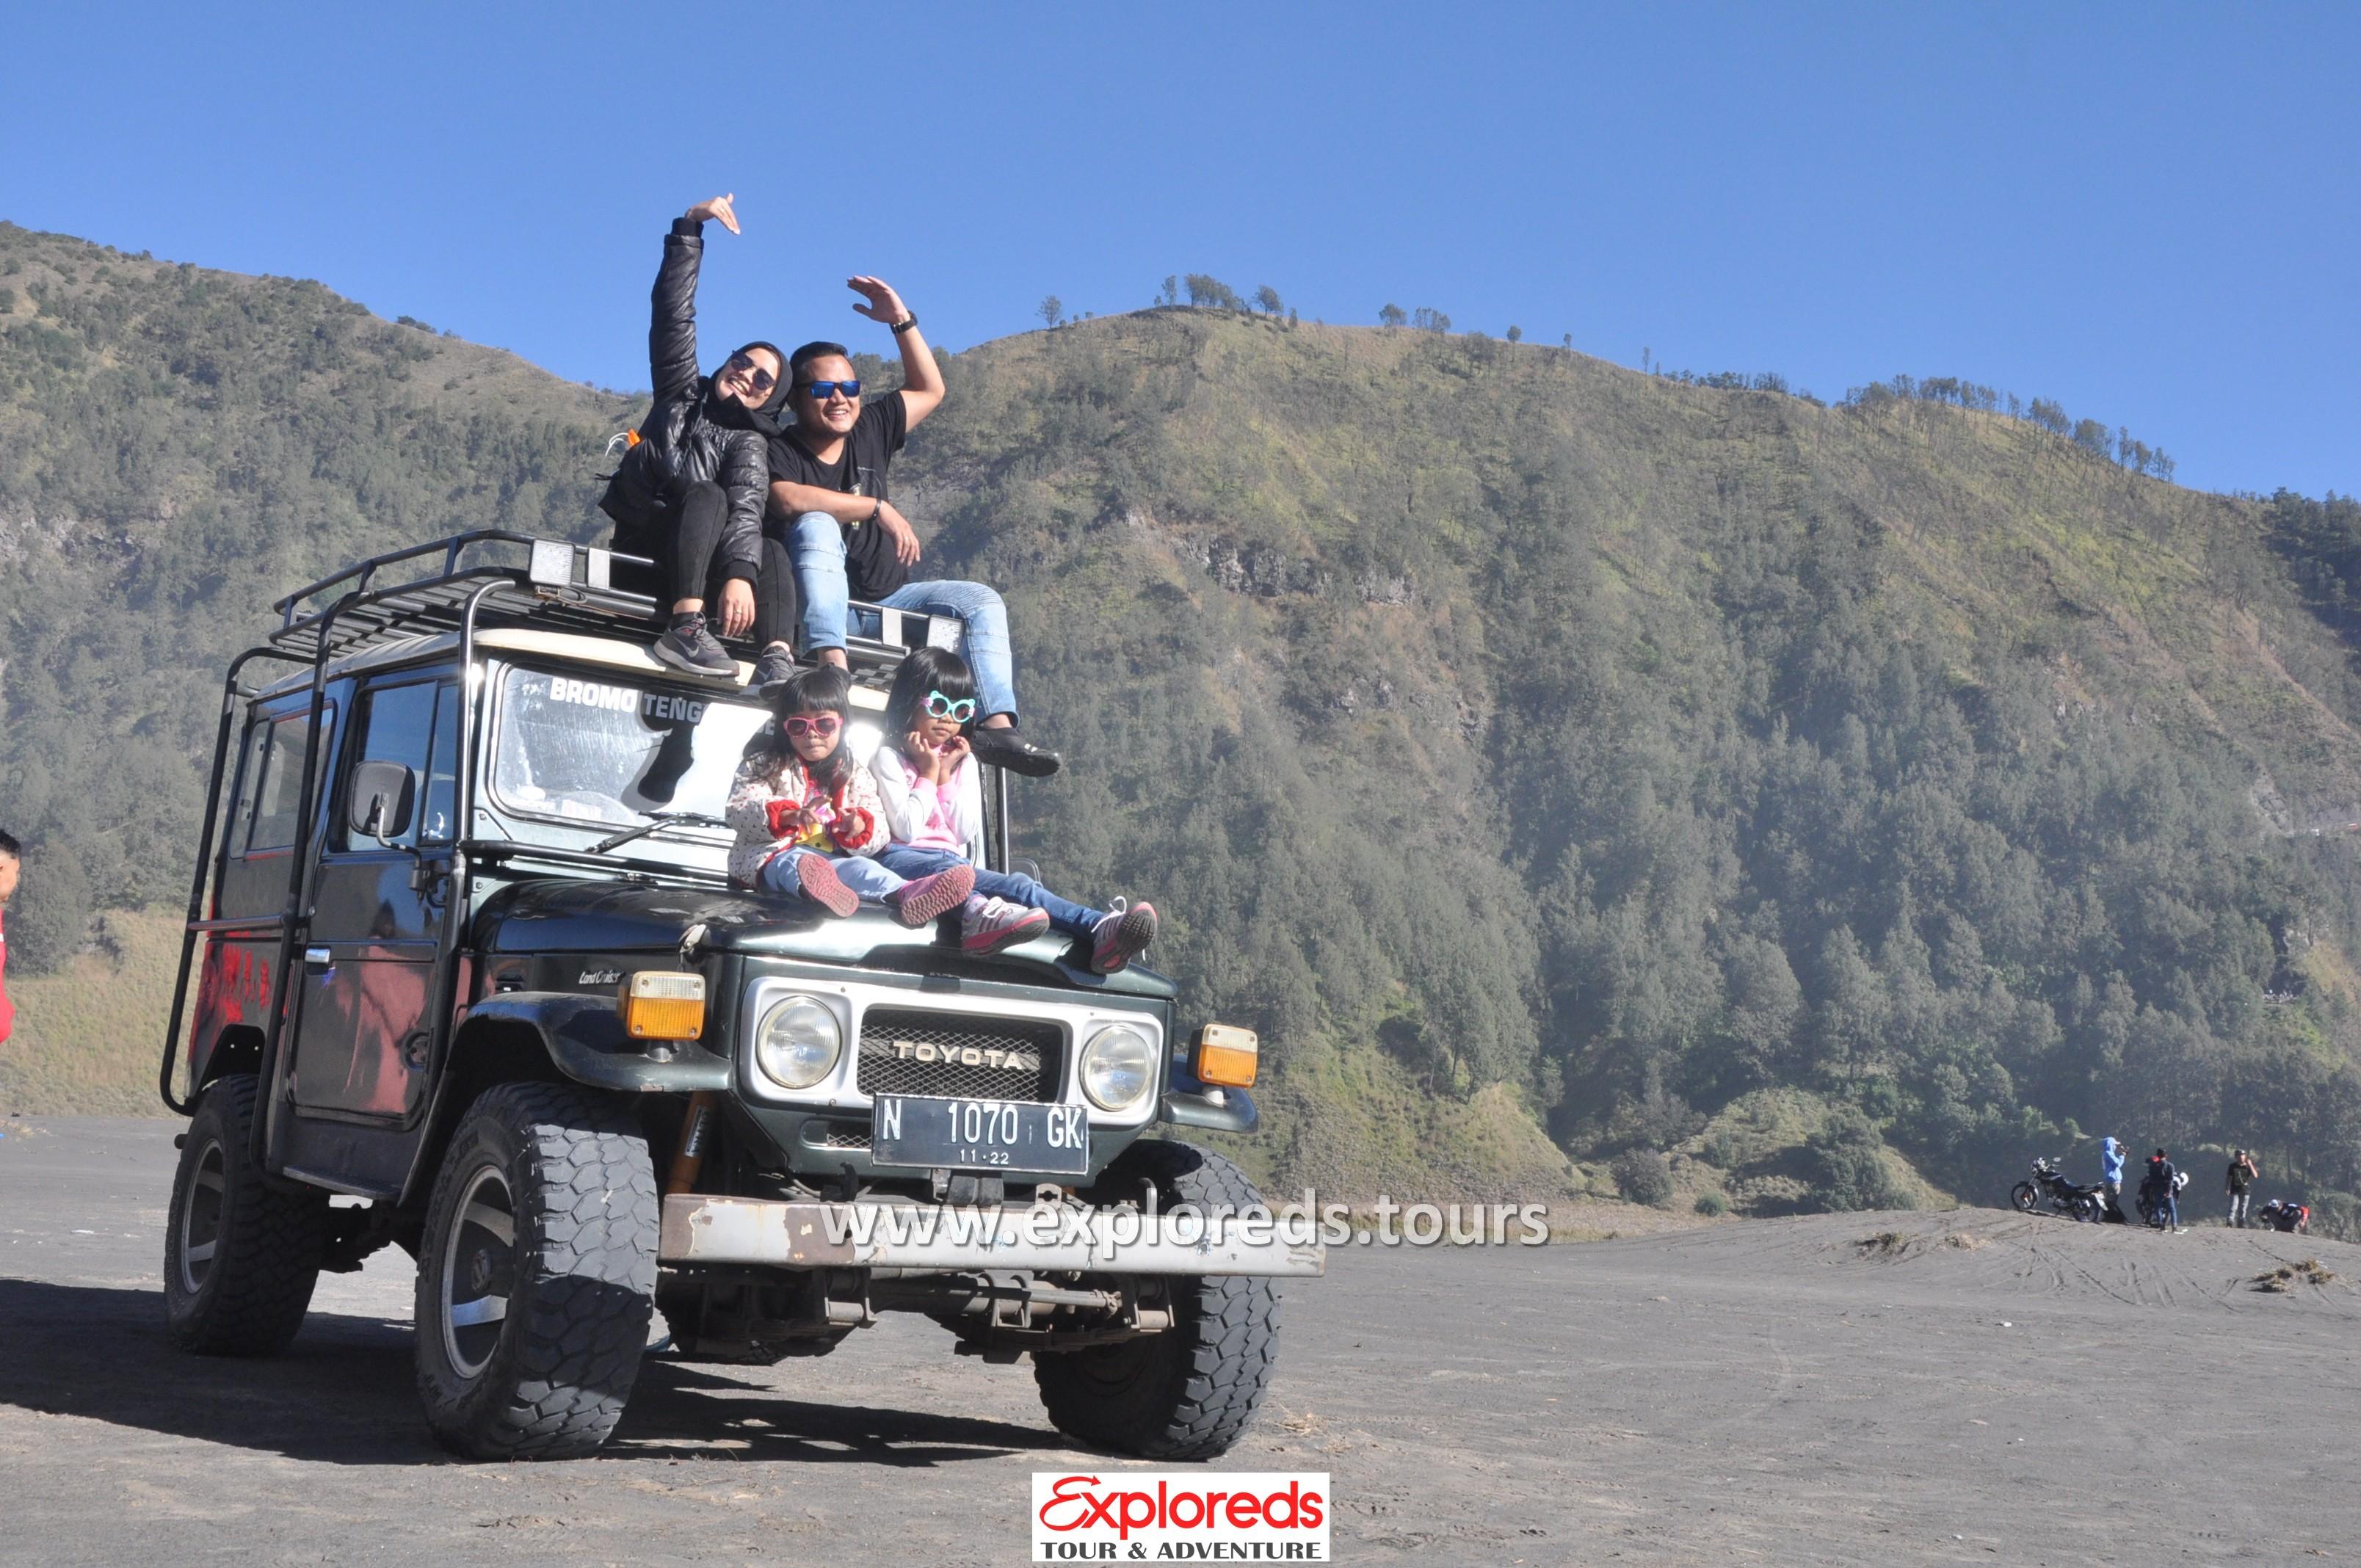 Paket Wisata Malang - WISATA MALANG BROMO - BATU 3 HARI 2 MALAM